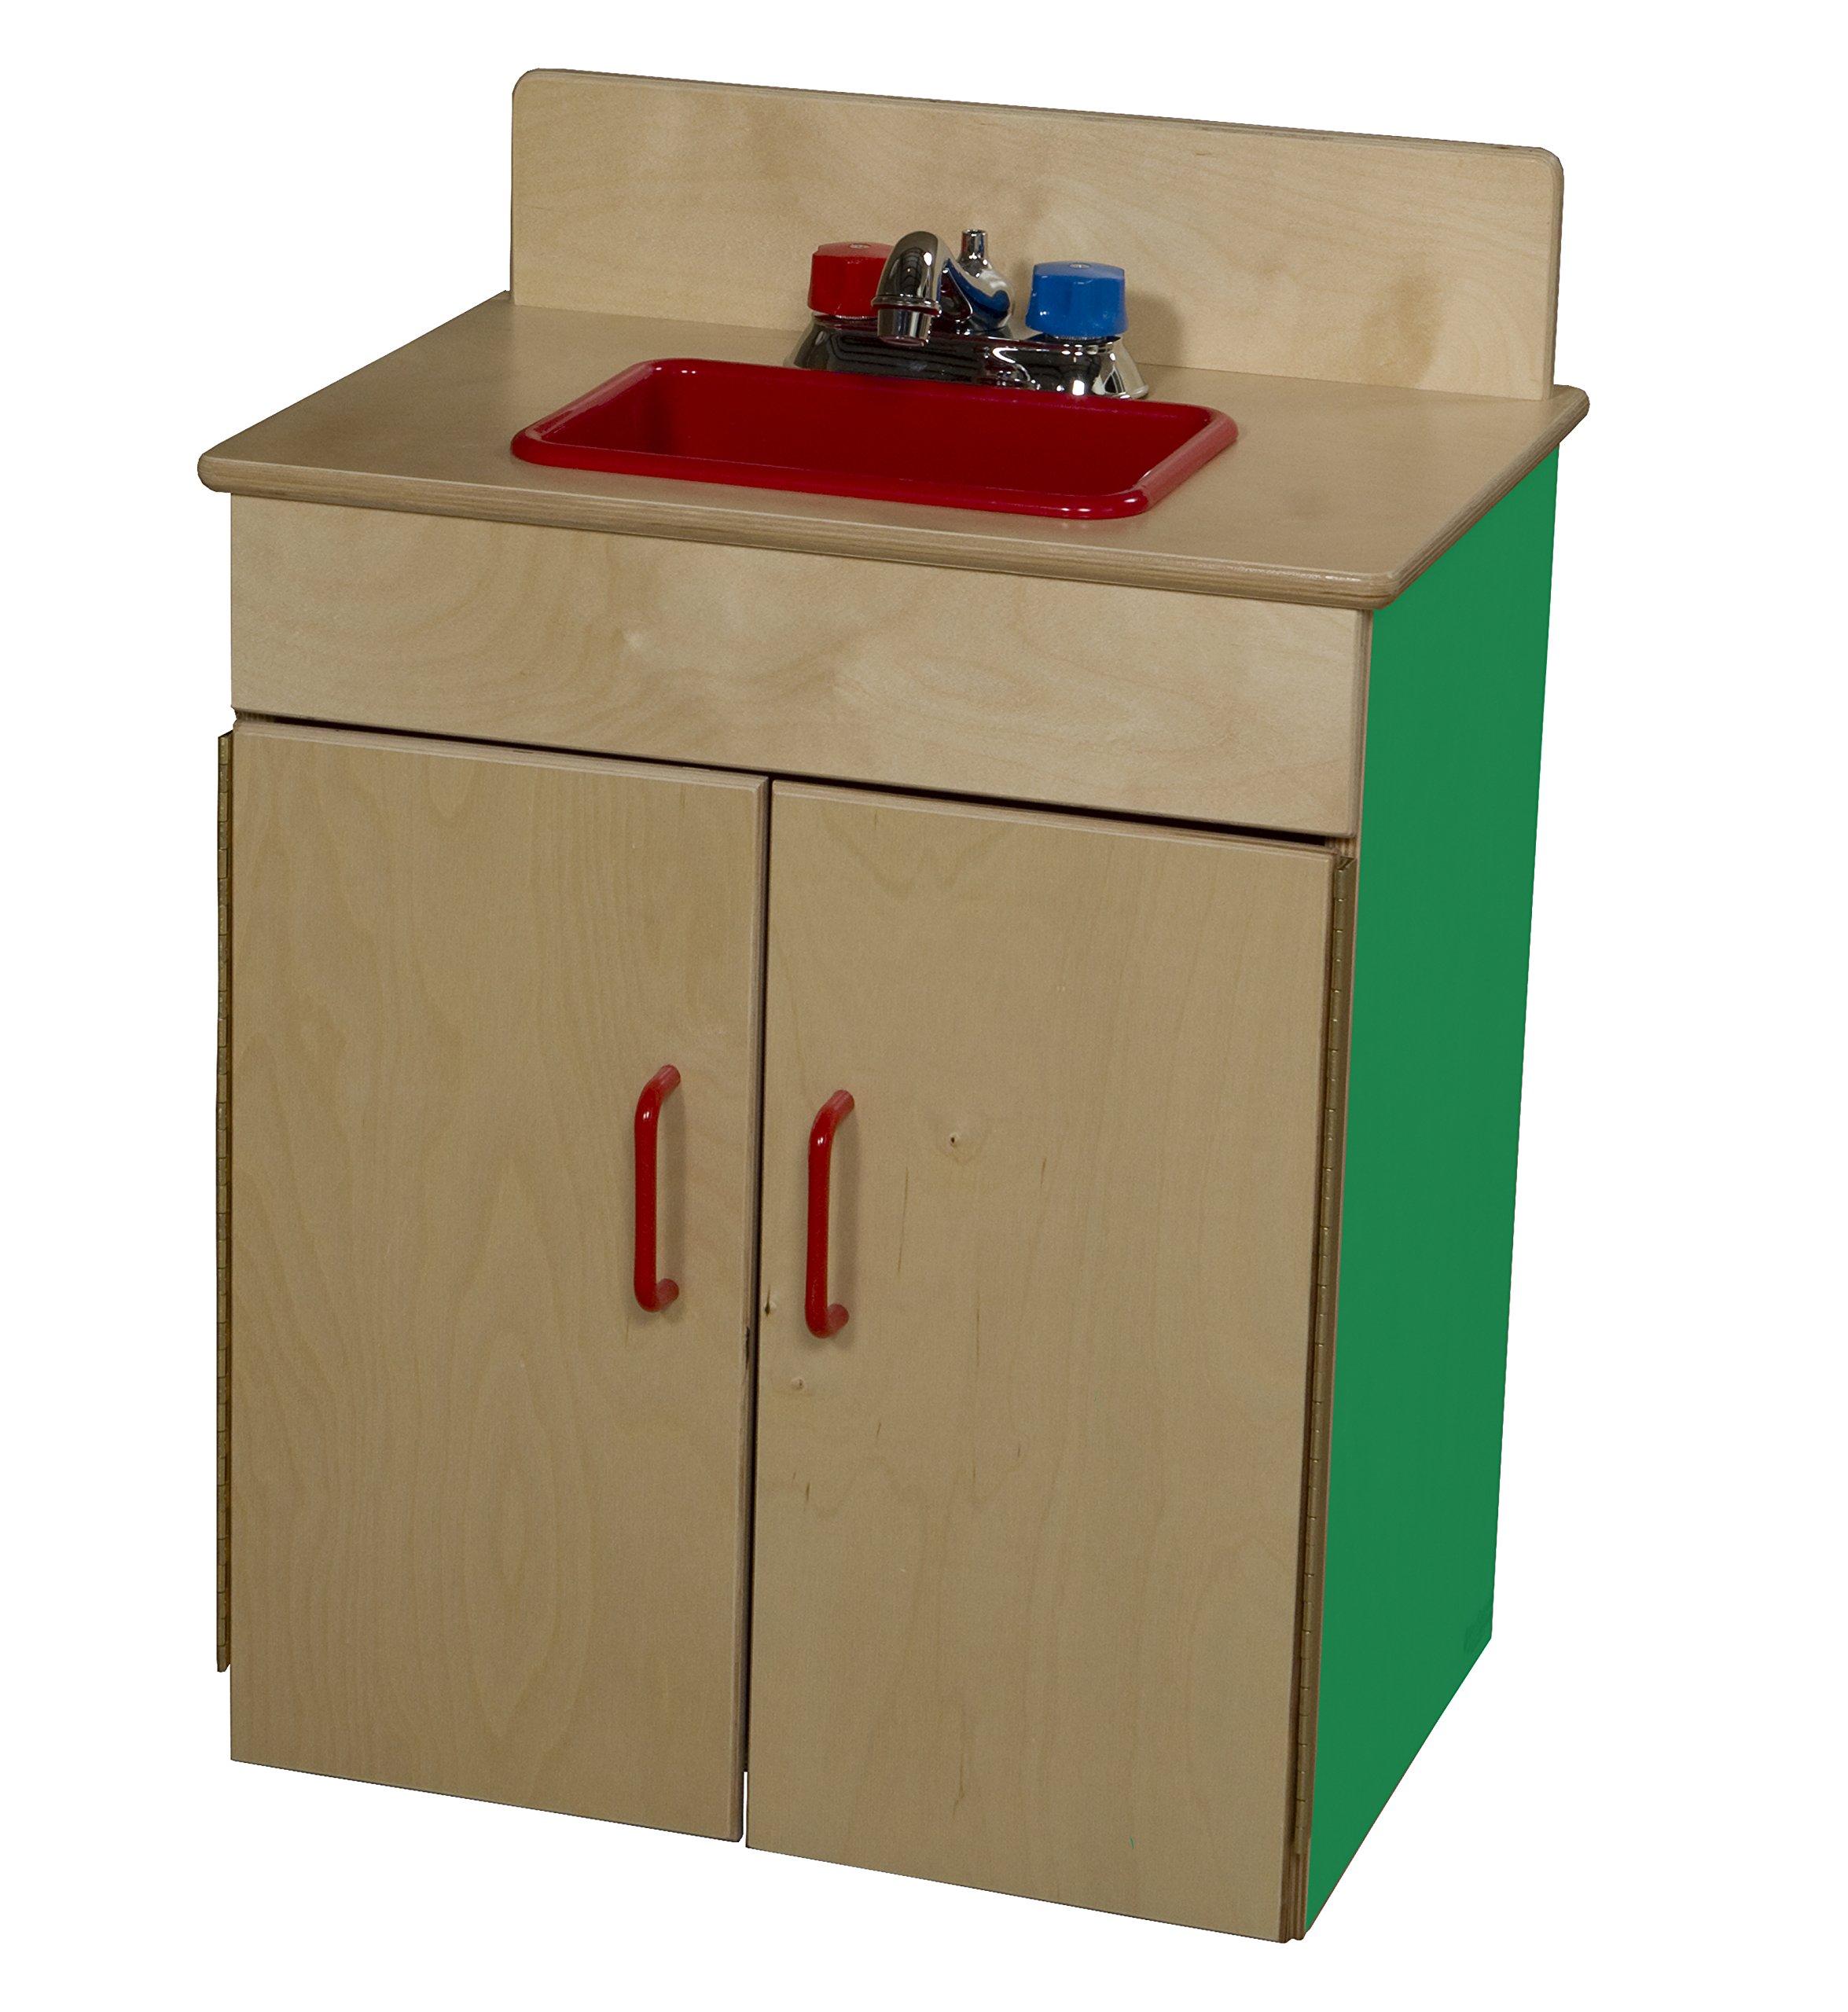 Wood Designs 10200G Green Apple Sink